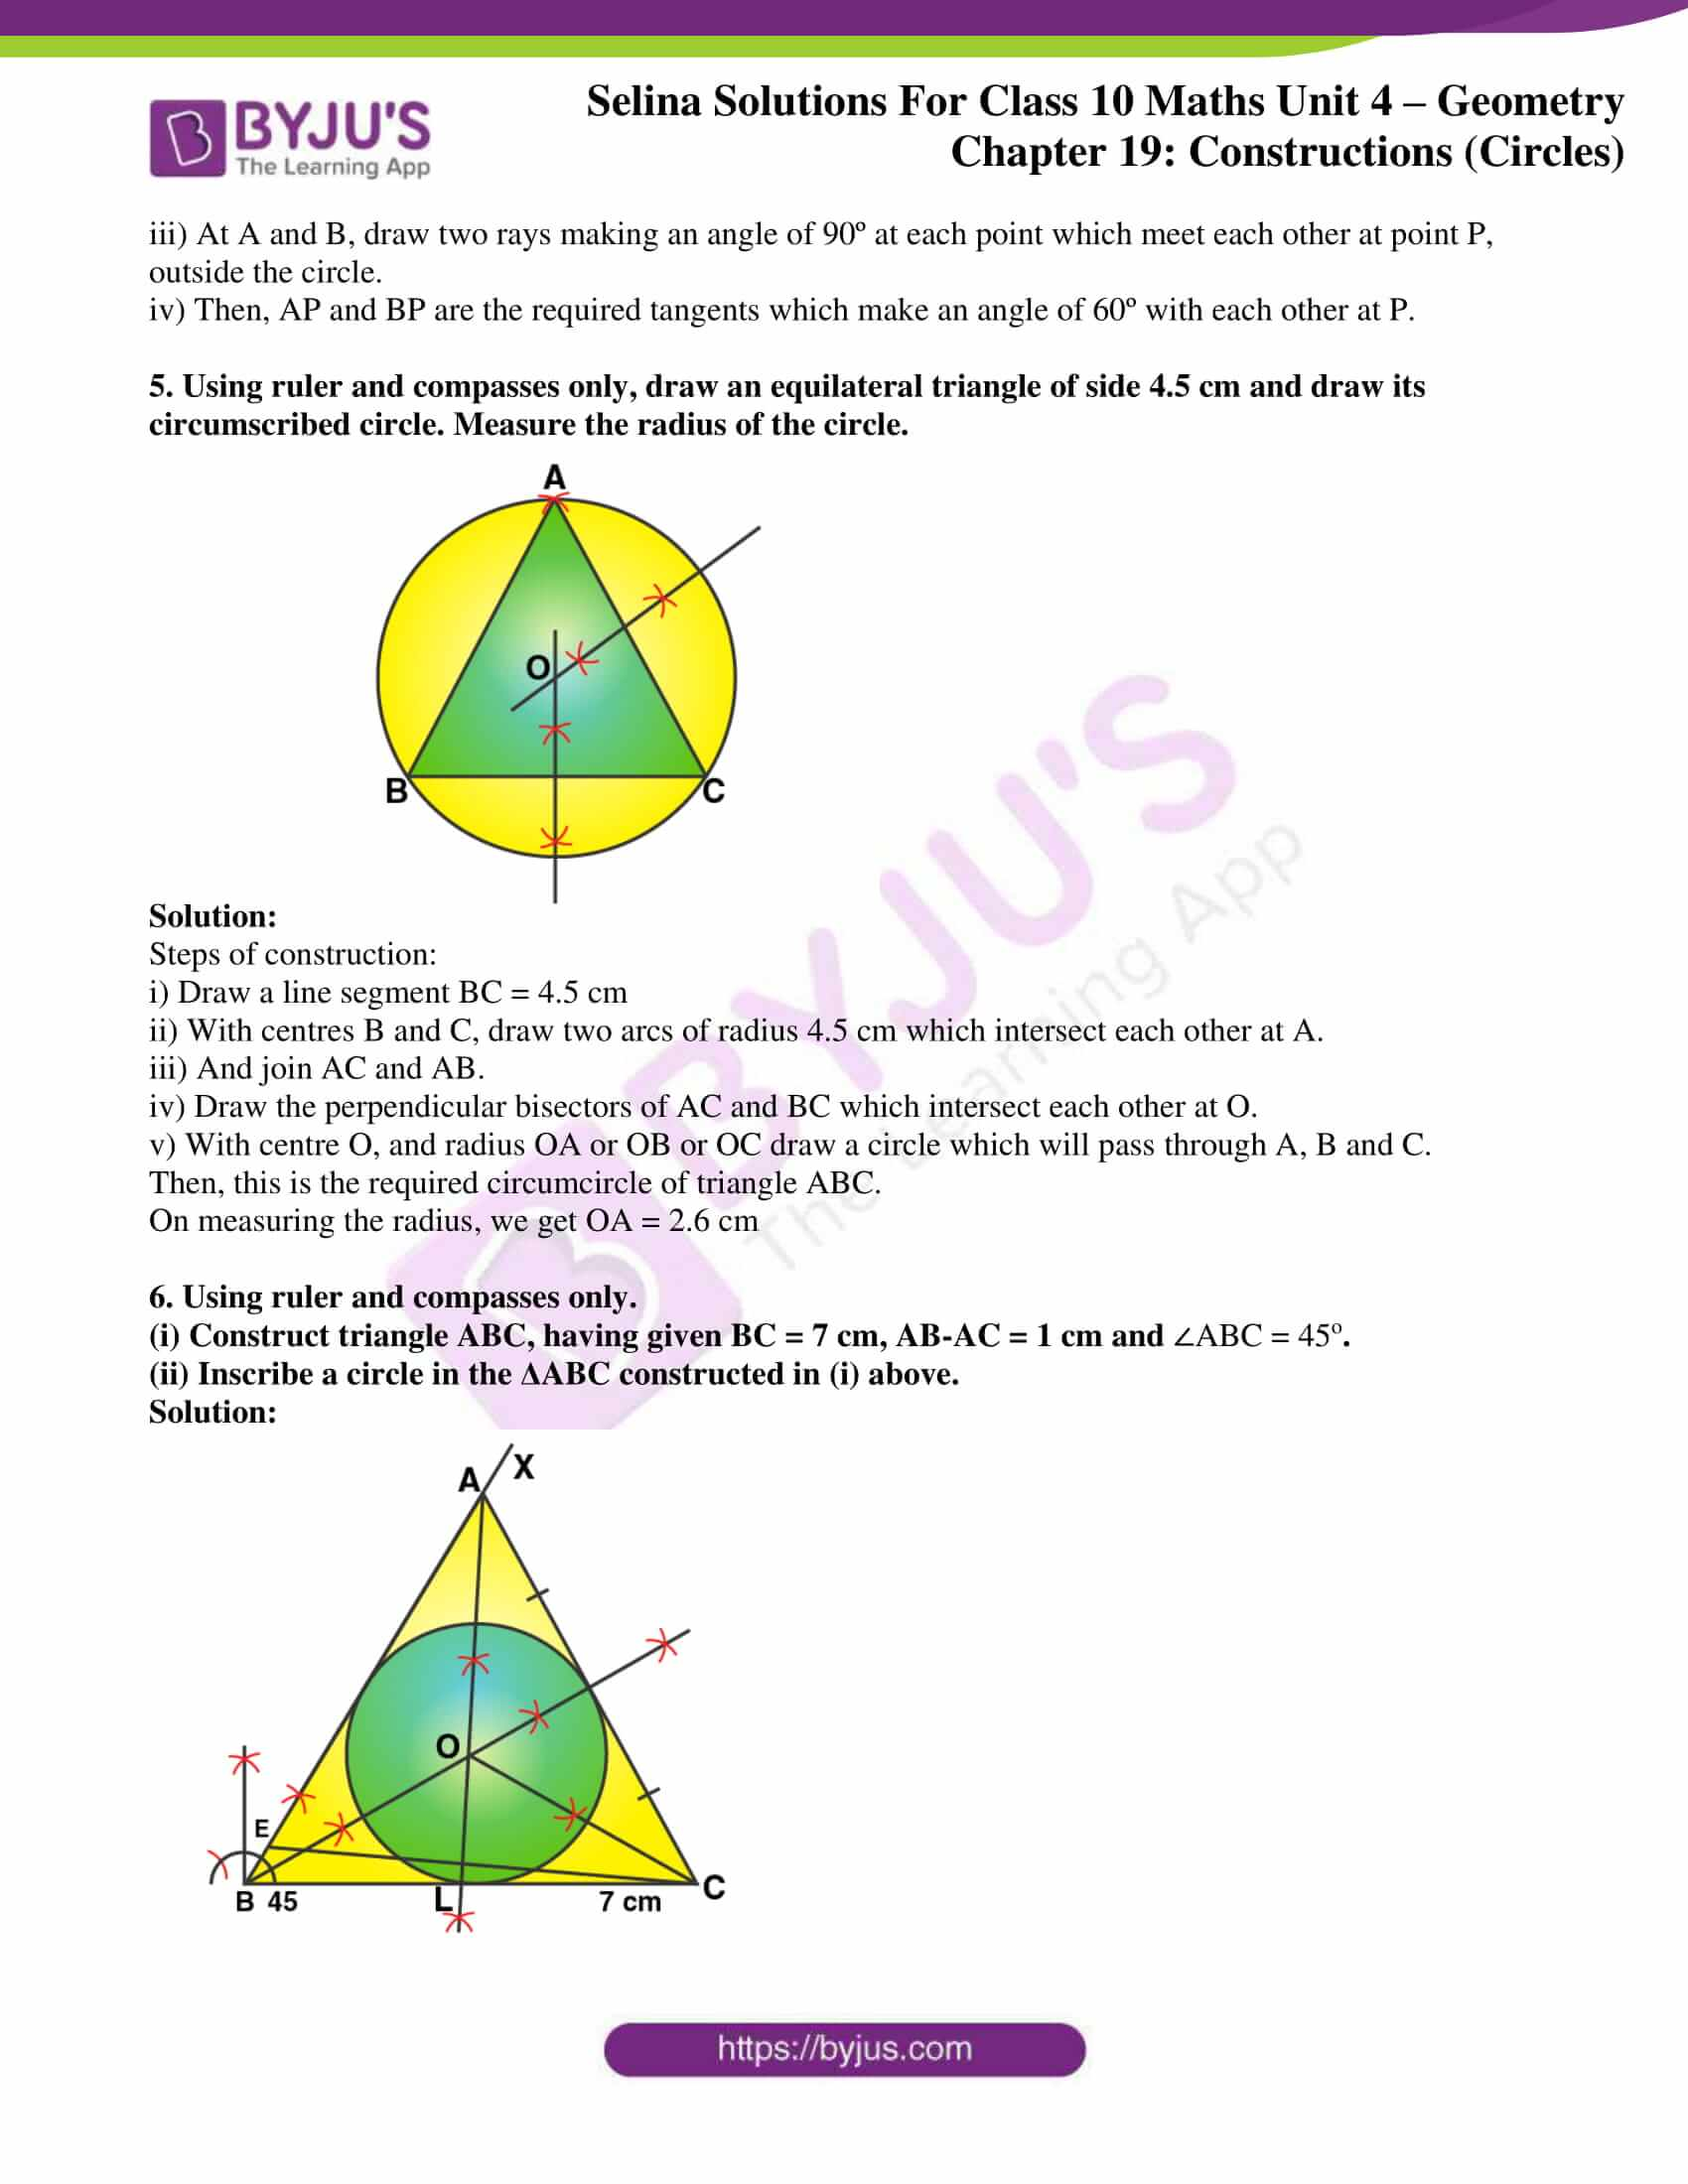 selina-sol-maths-class-10-ch-19-3